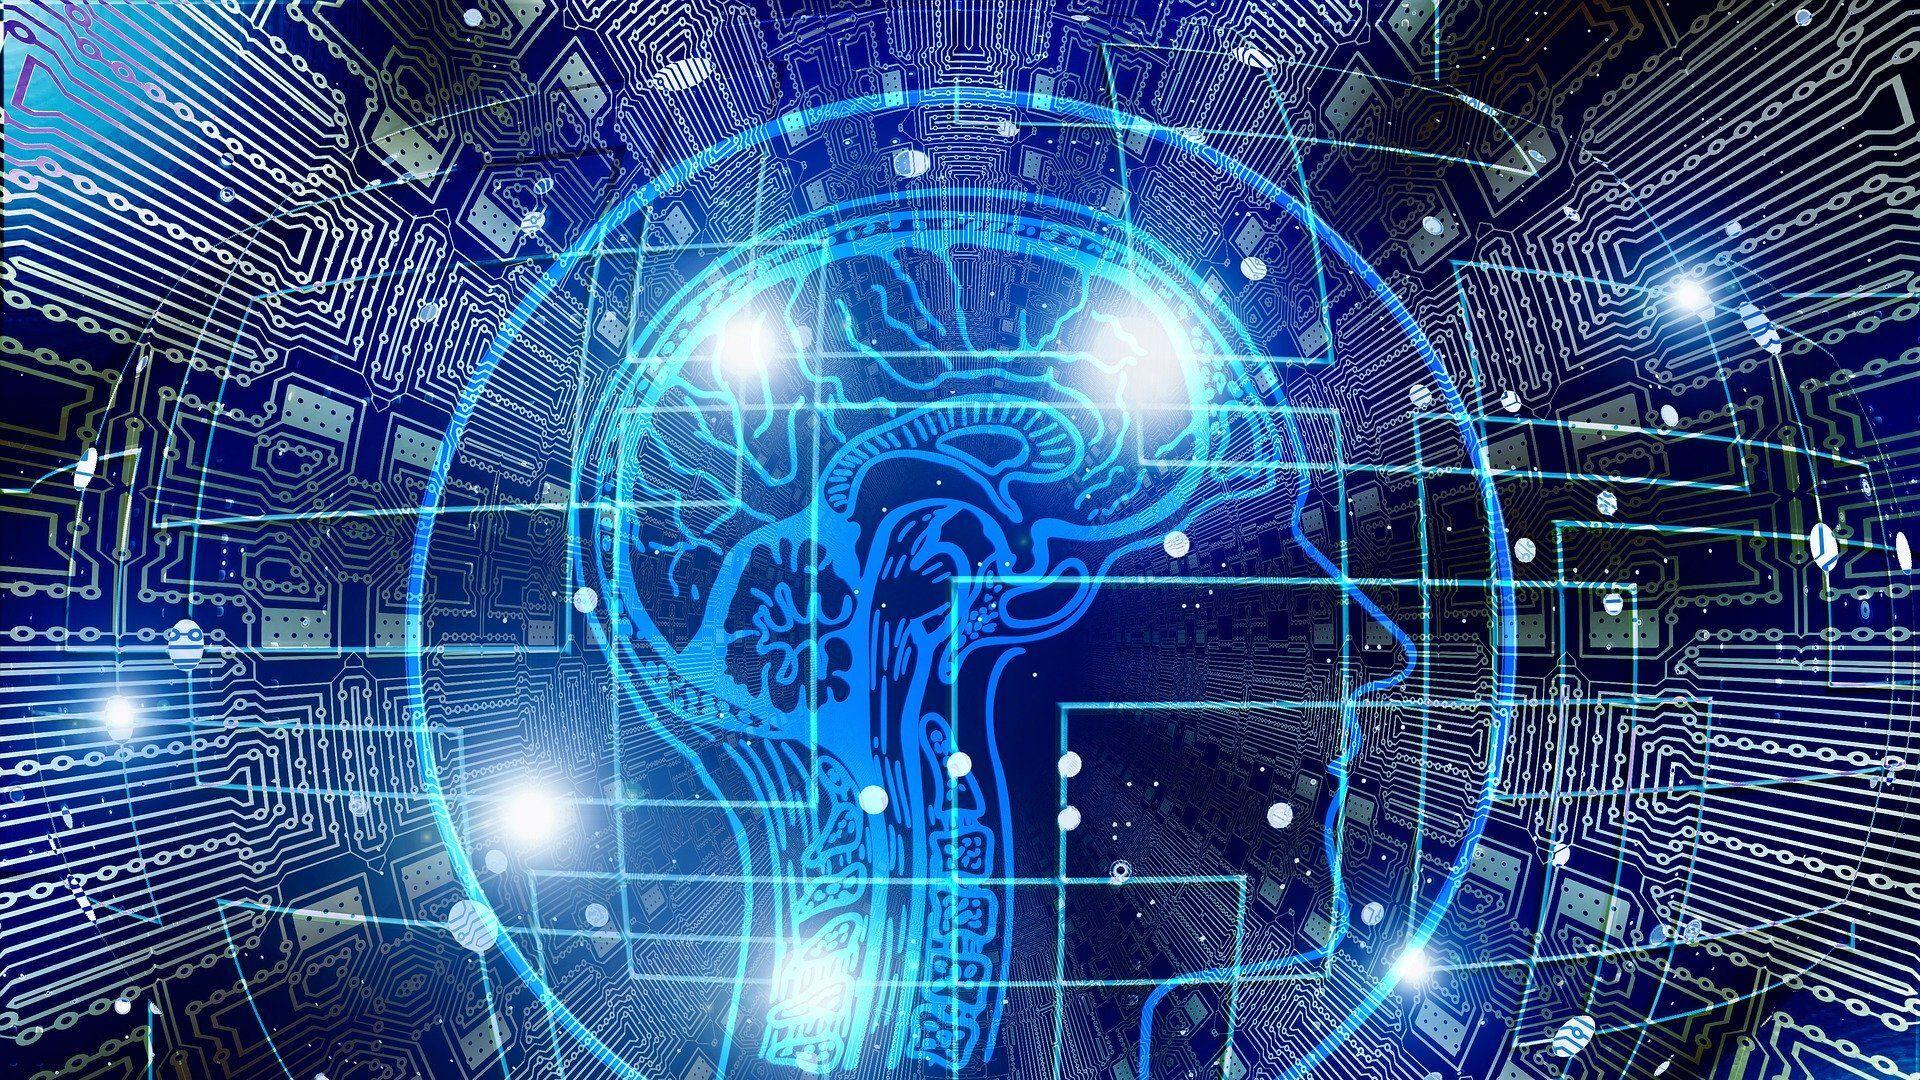 Artificial intelligence brain think - Sputnik International, 1920, 08.09.2021